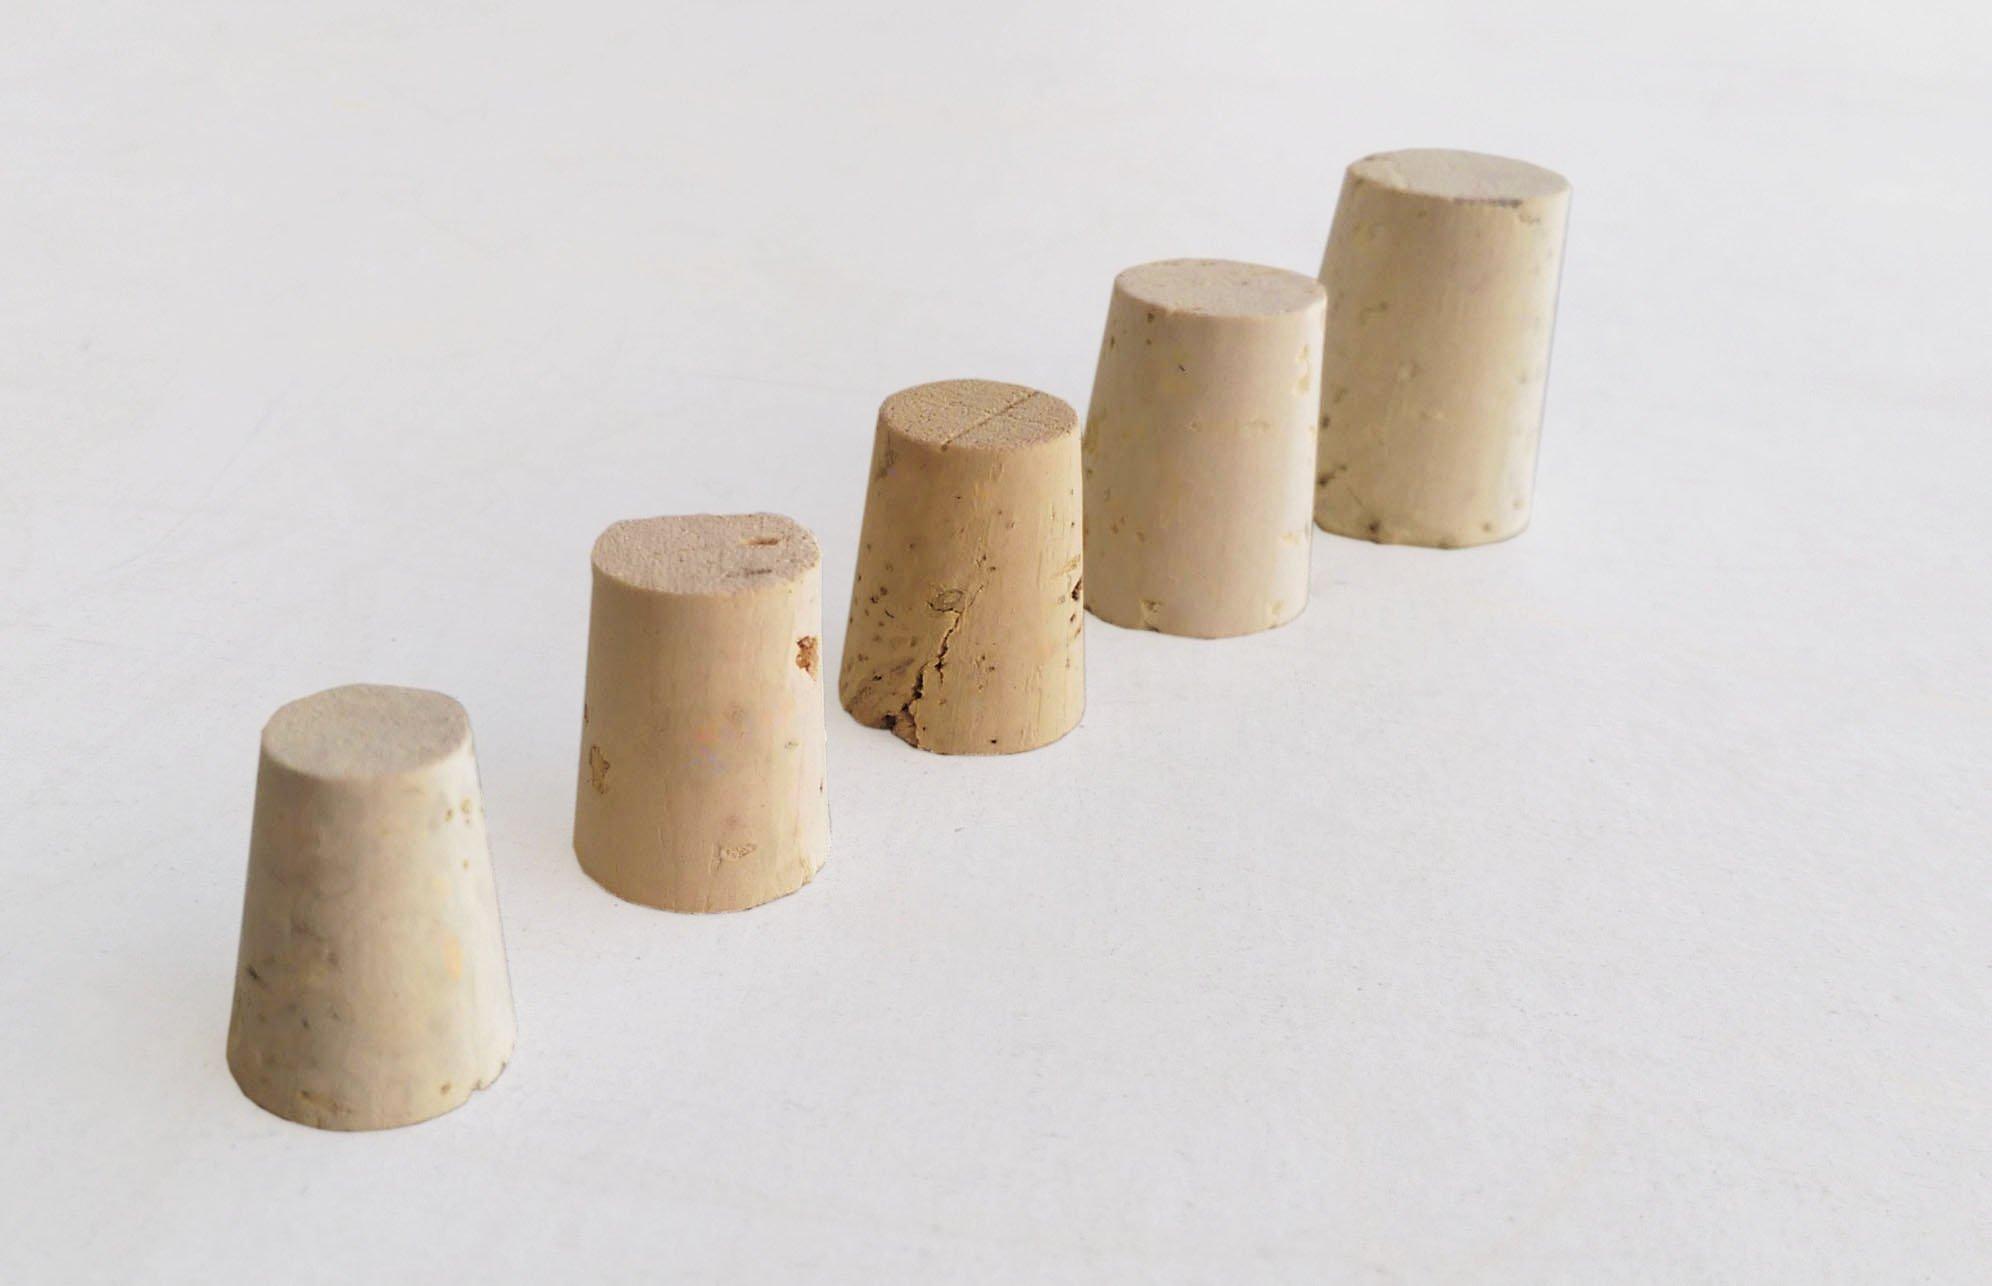 Small bag of Mixed Regular Length (RL) Natural Tapered Corks Bag of 45 (RL04, RL05, RL06, RL08, RL10) by Jelinek Cork Group (Image #4)